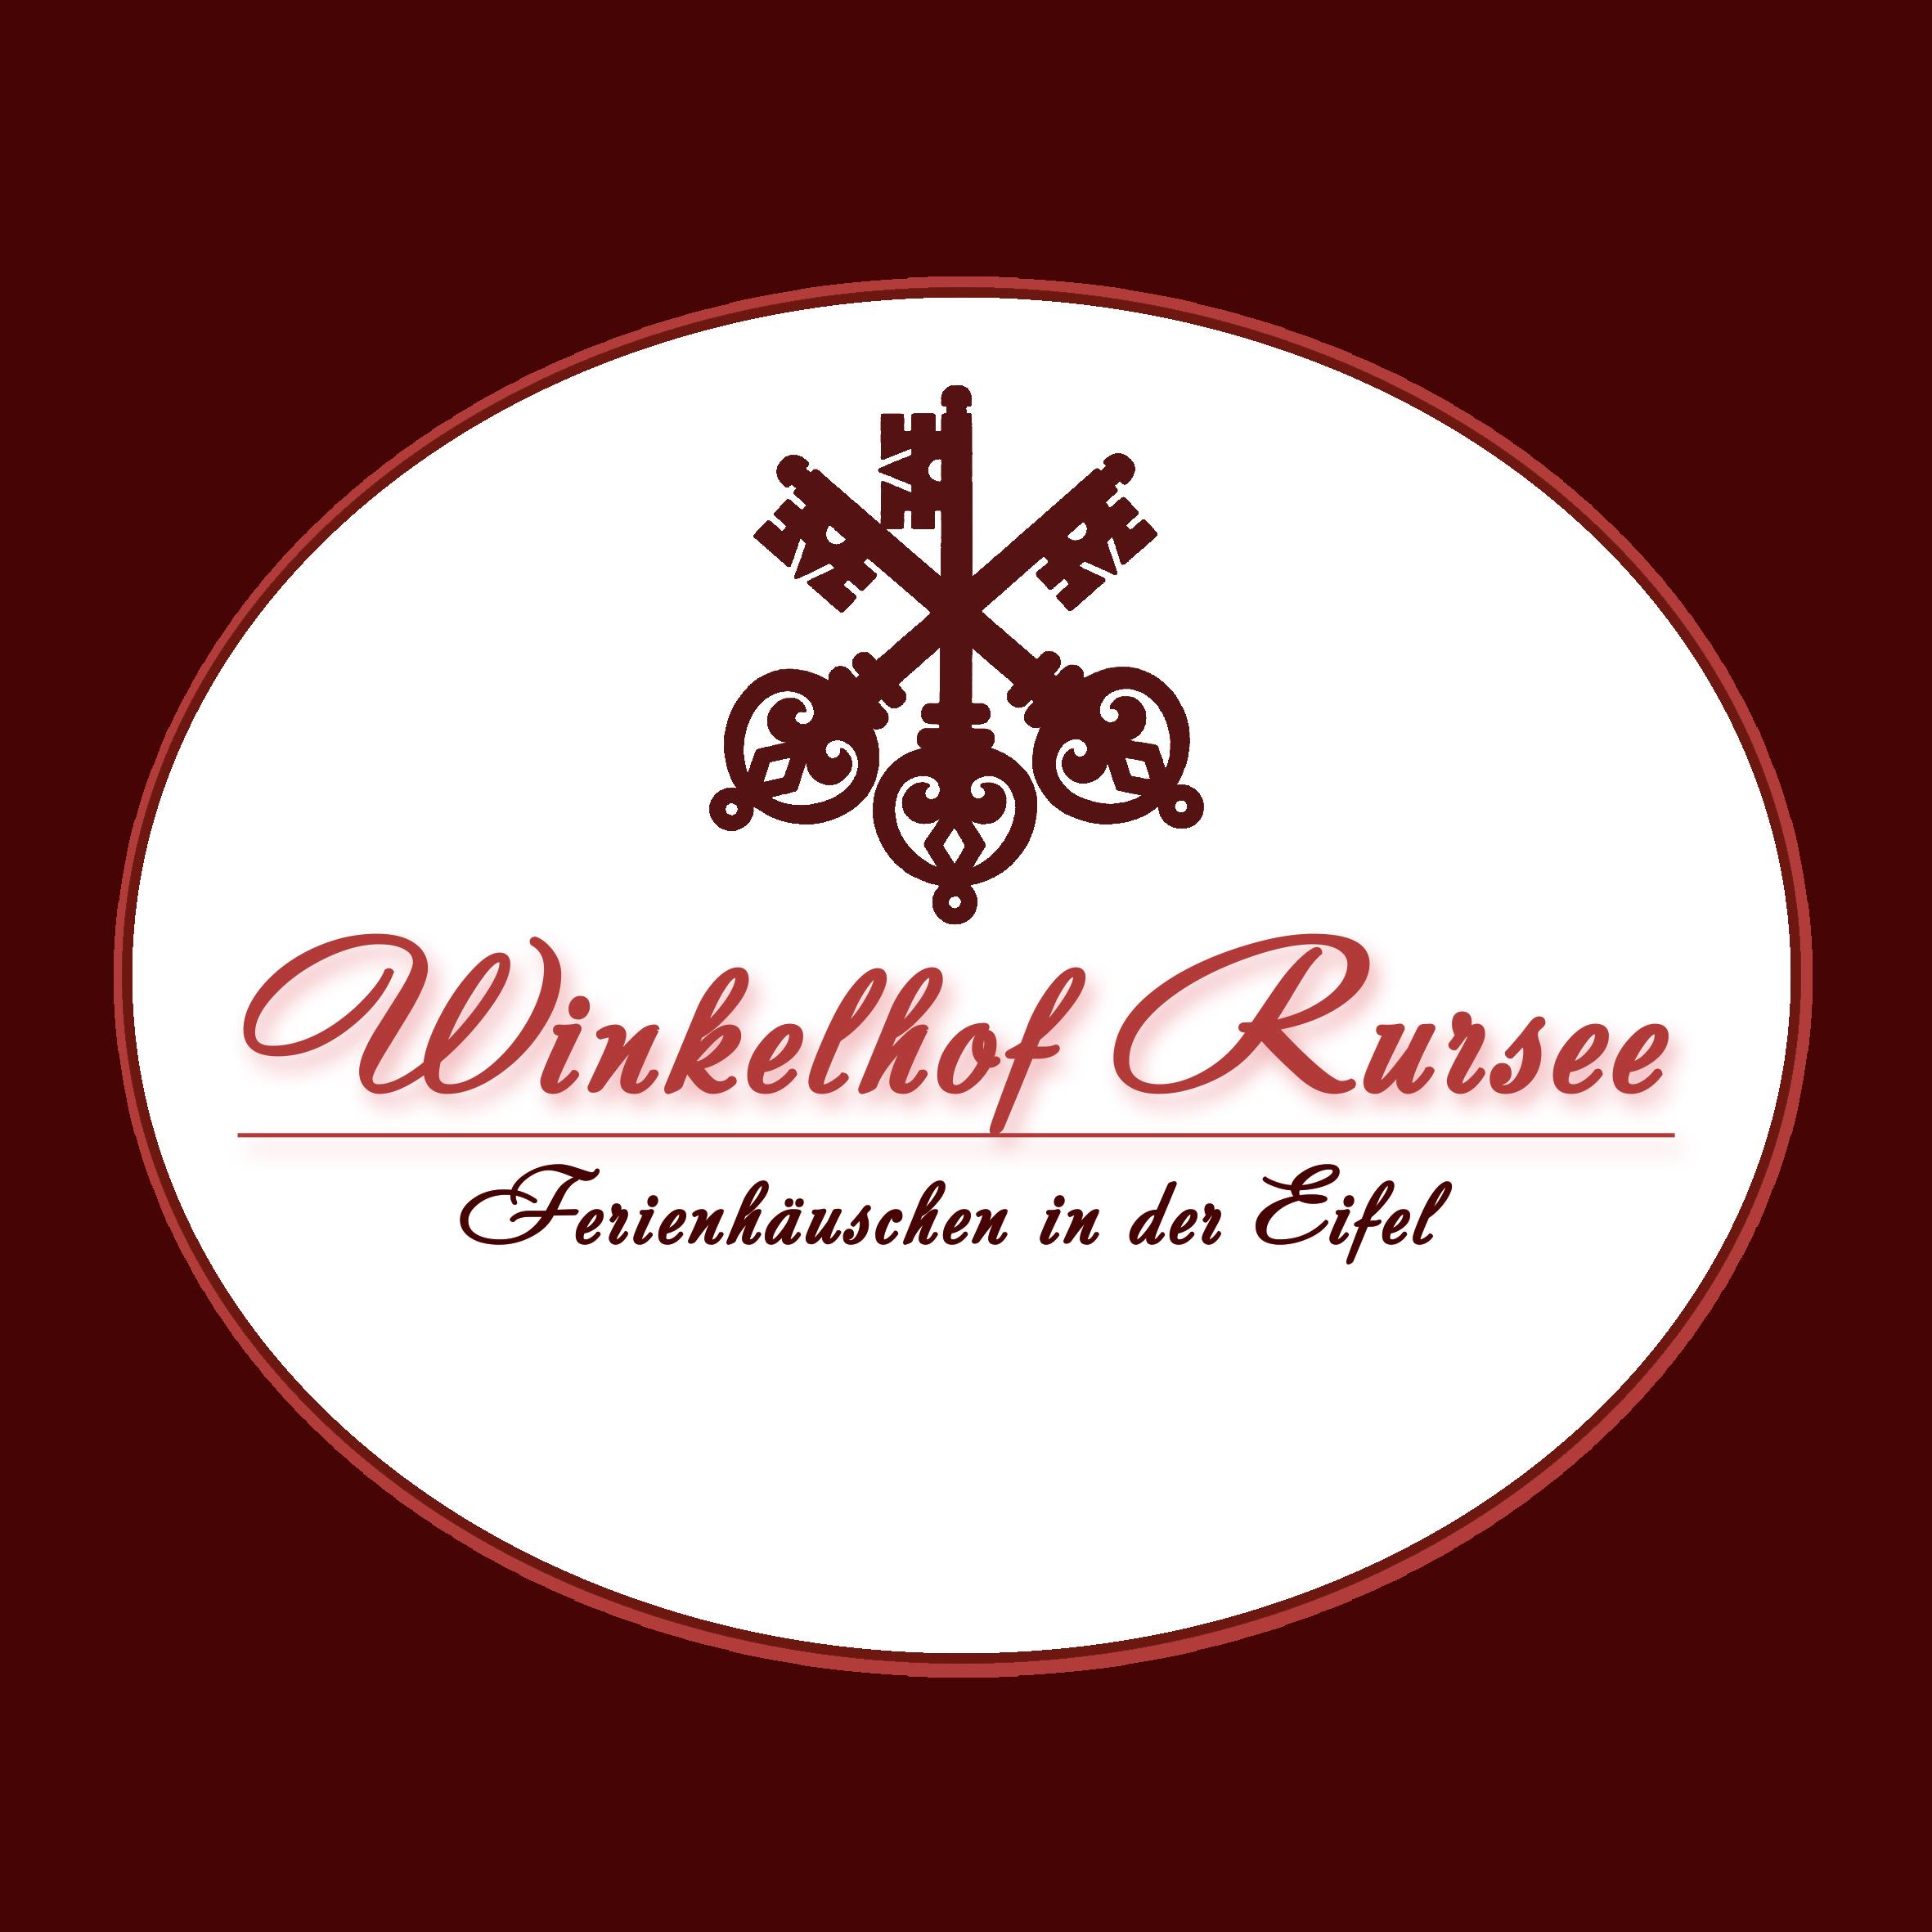 2016_05_23 Logo WinkelhofRursee